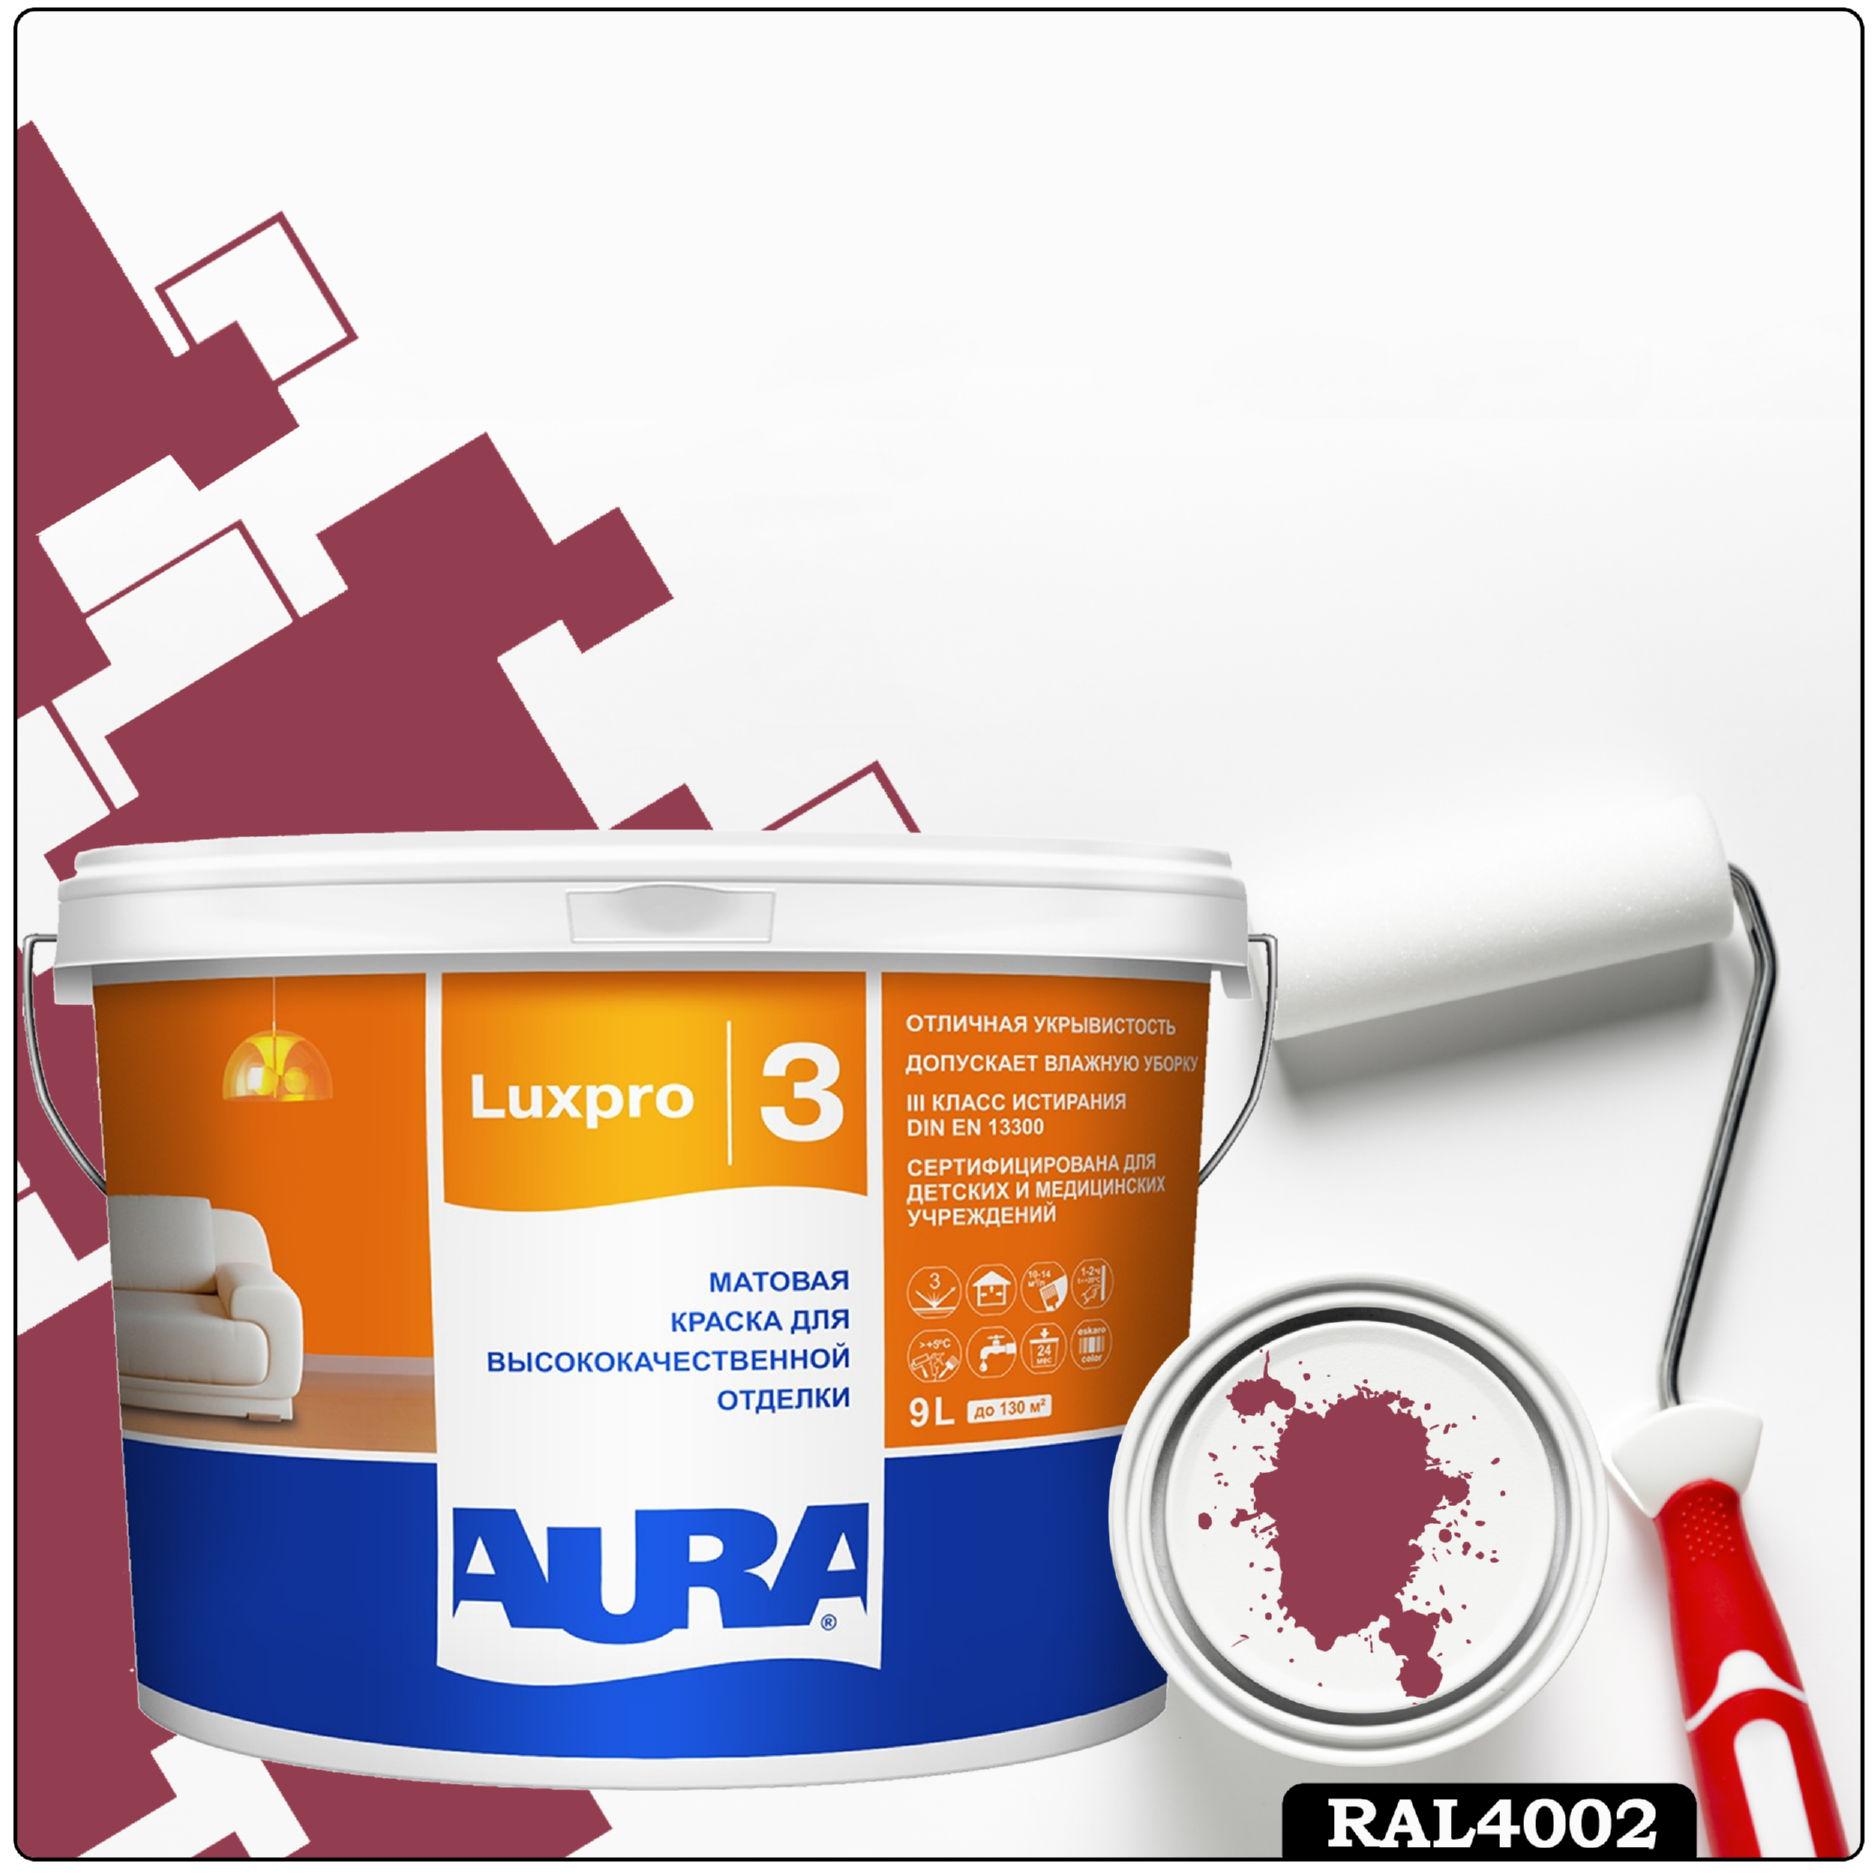 Фото 2 - Краска Aura LuxPRO 3, RAL 4002 Красно-фиолетовый, латексная, шелково-матовая, интерьерная, 9л, Аура.